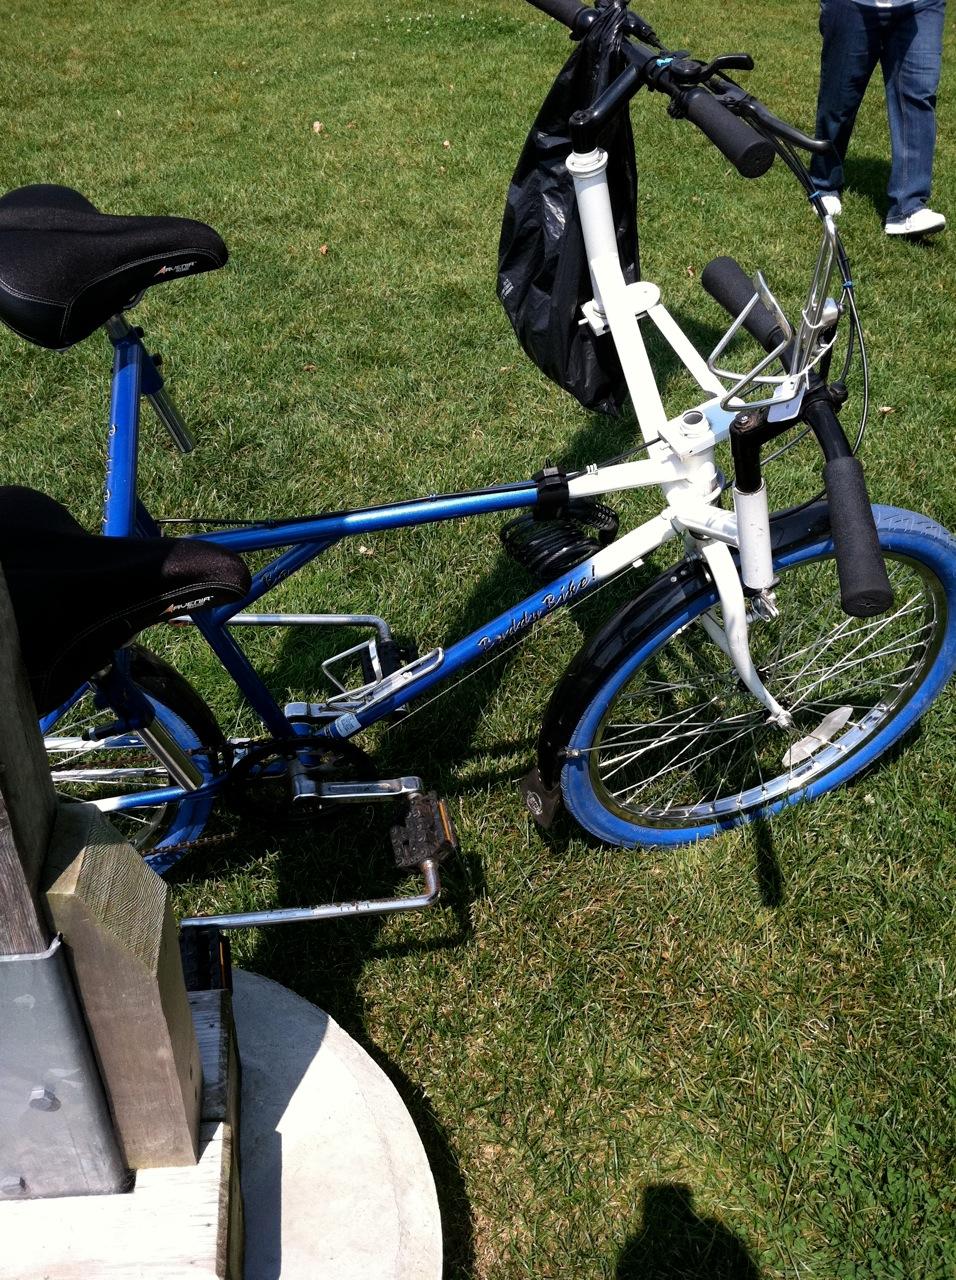 Buddy Bike - Side By Side Tandem | Adventure Boldly